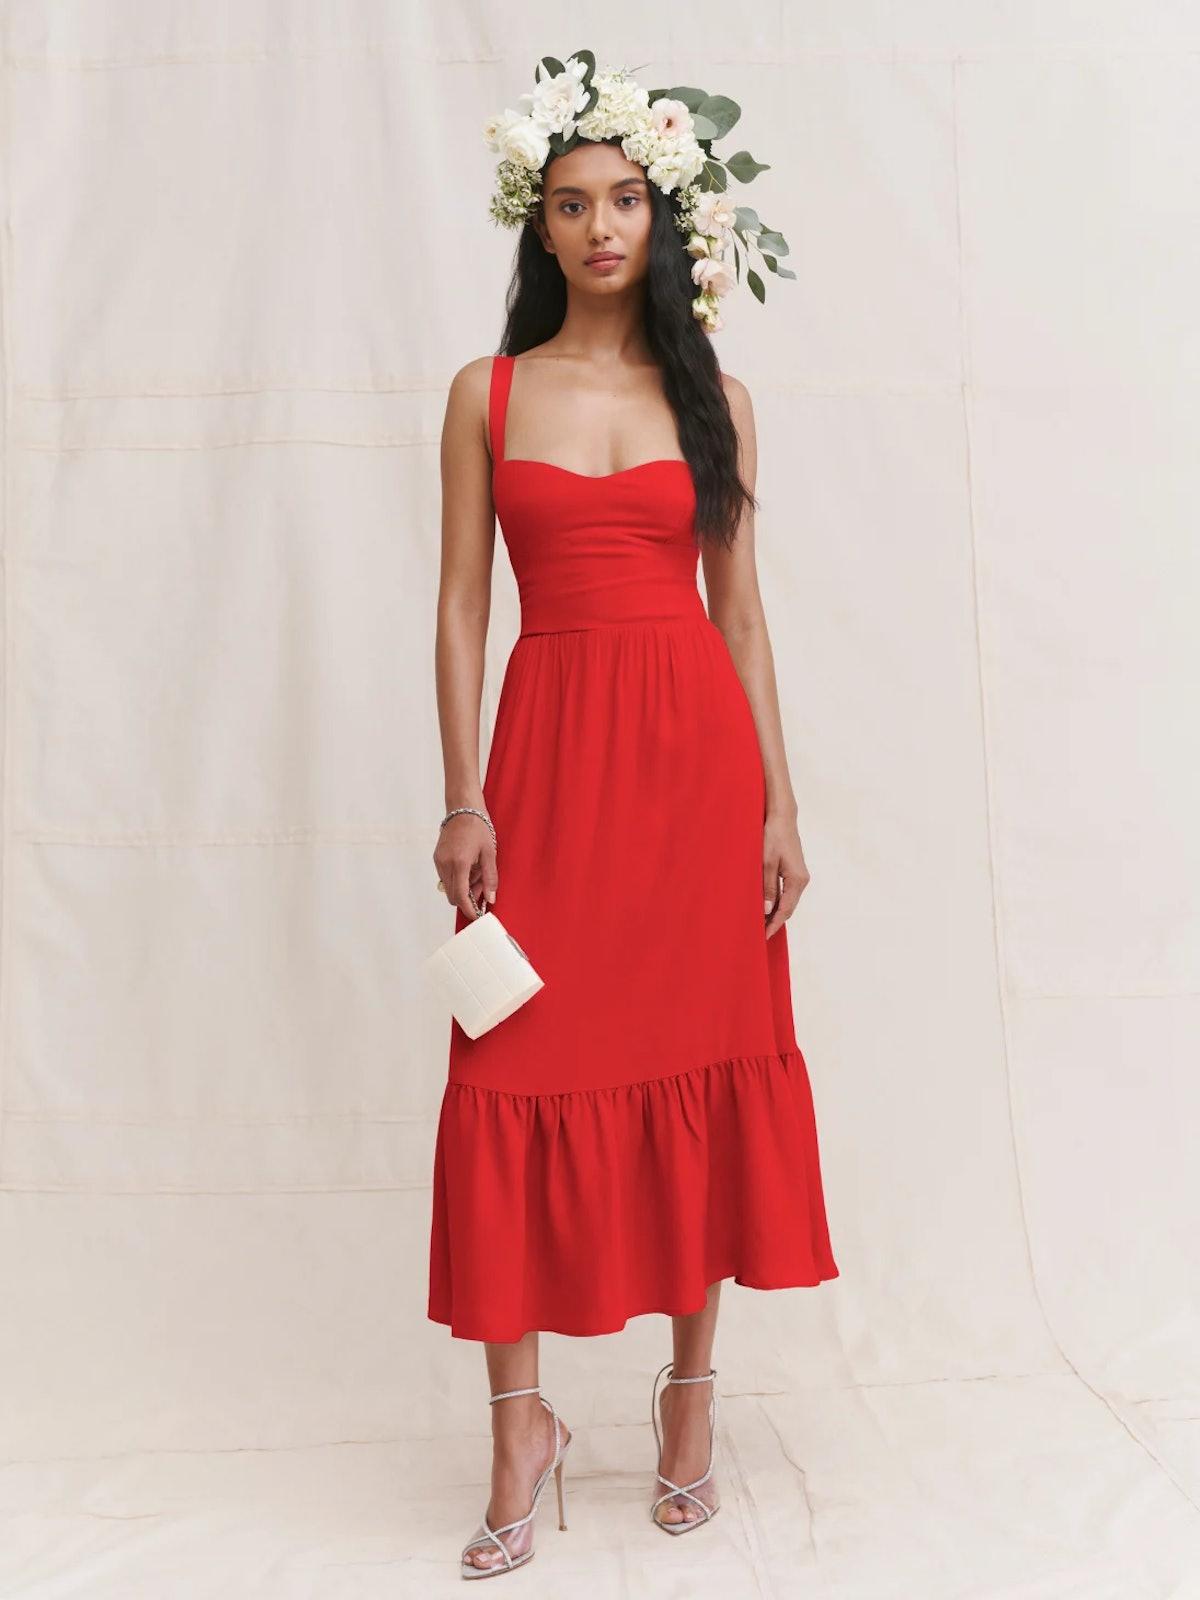 Reformation's Celestia Dress in red.